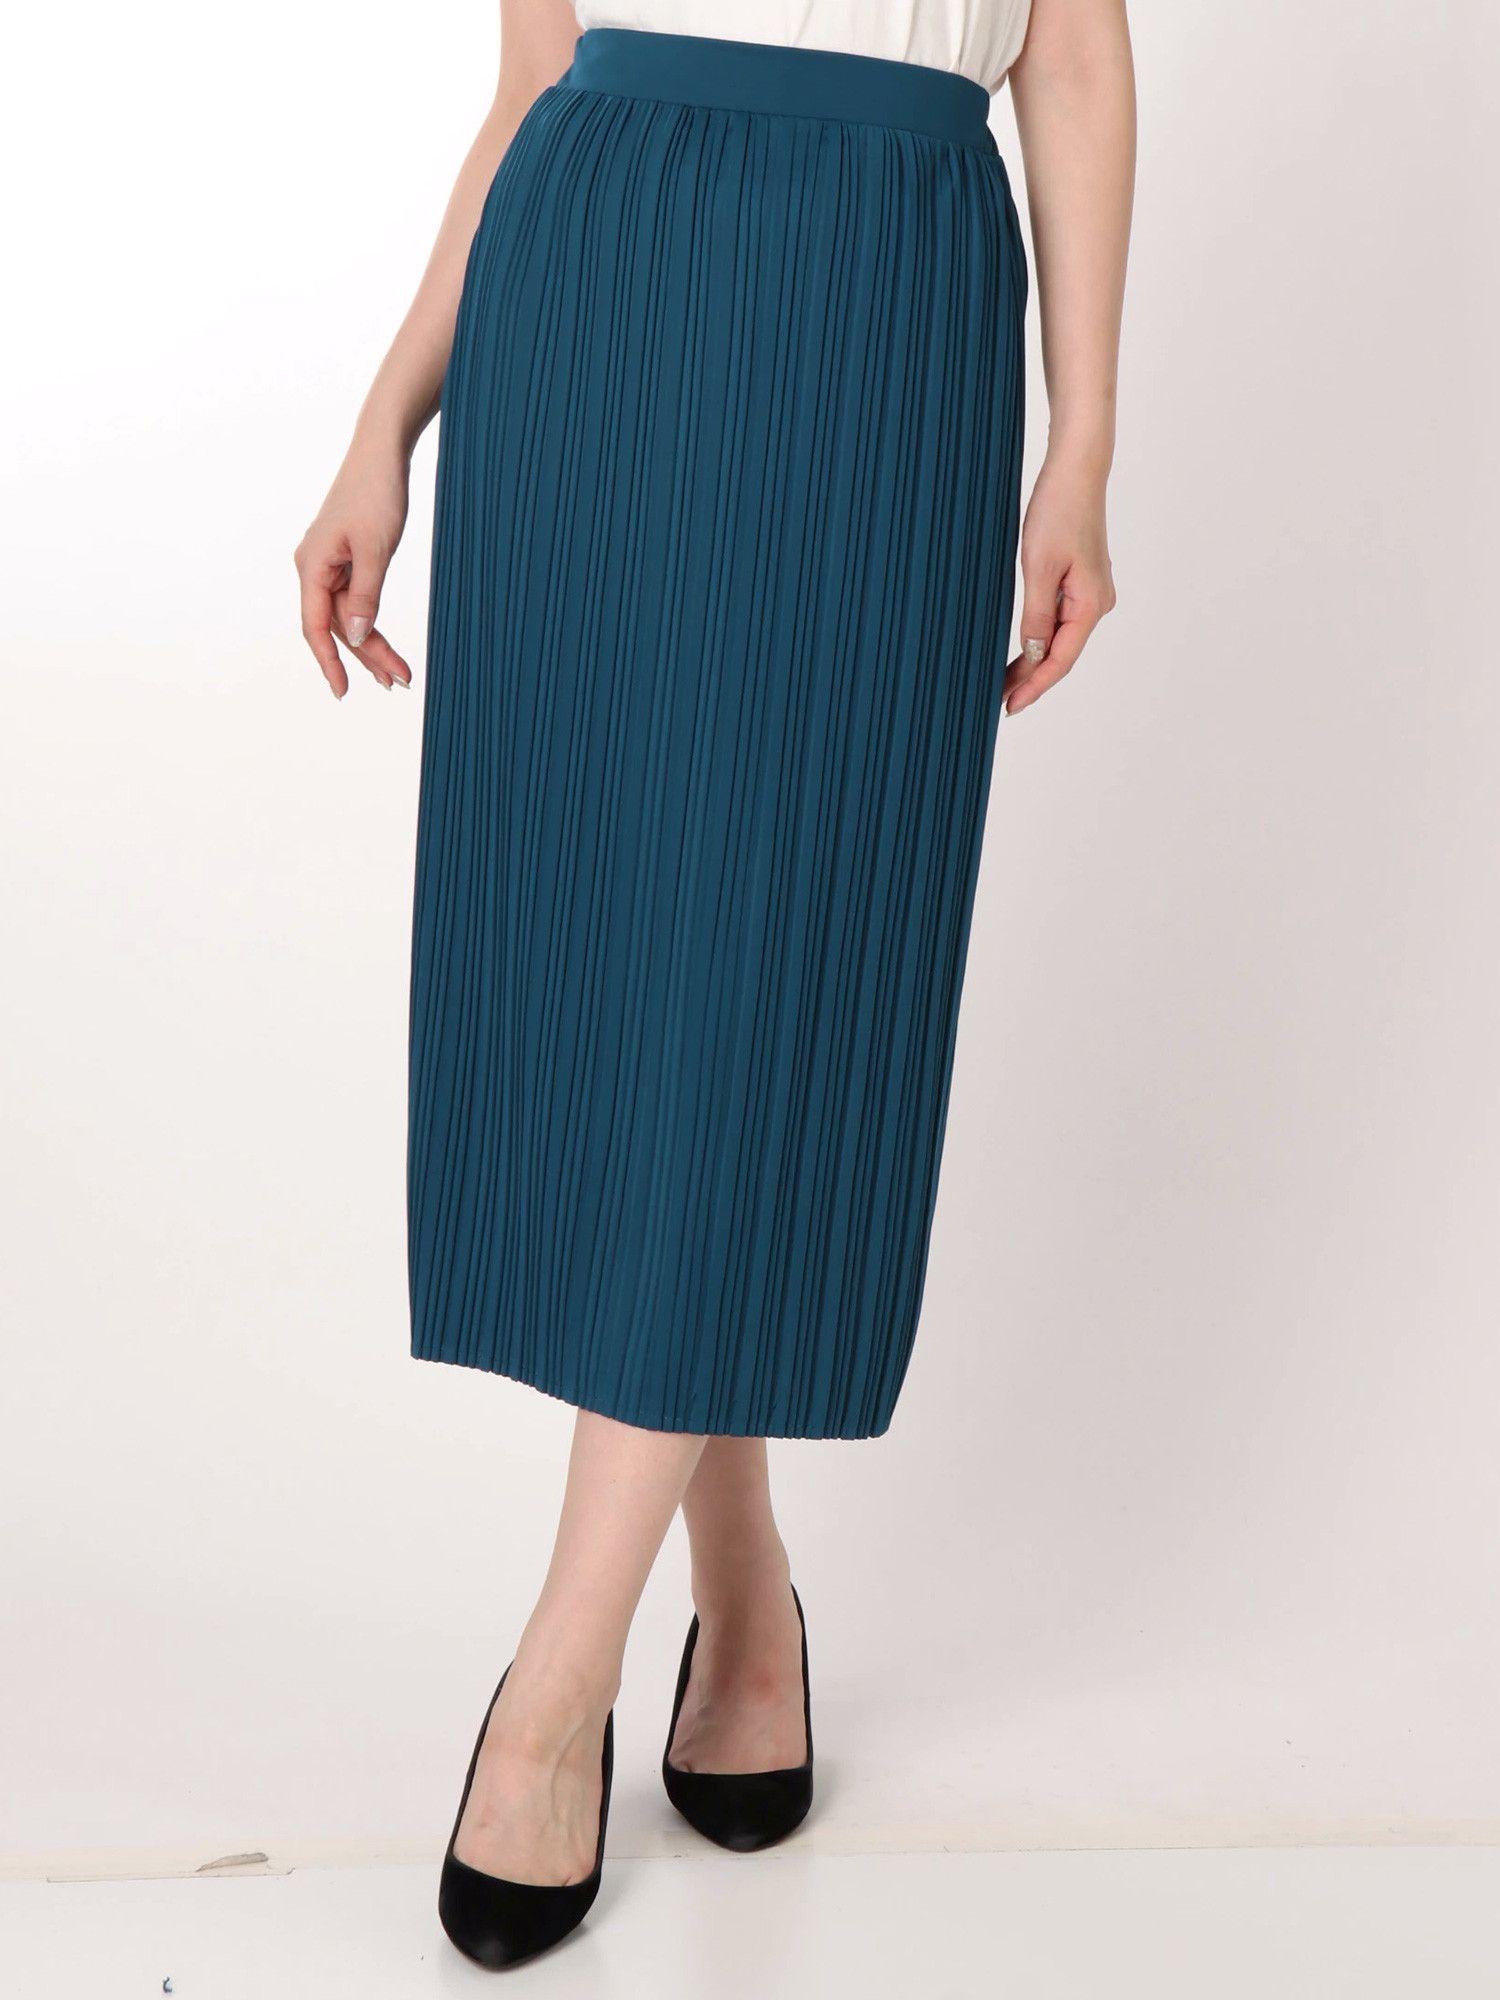 MURUA_カットプリーツスカート